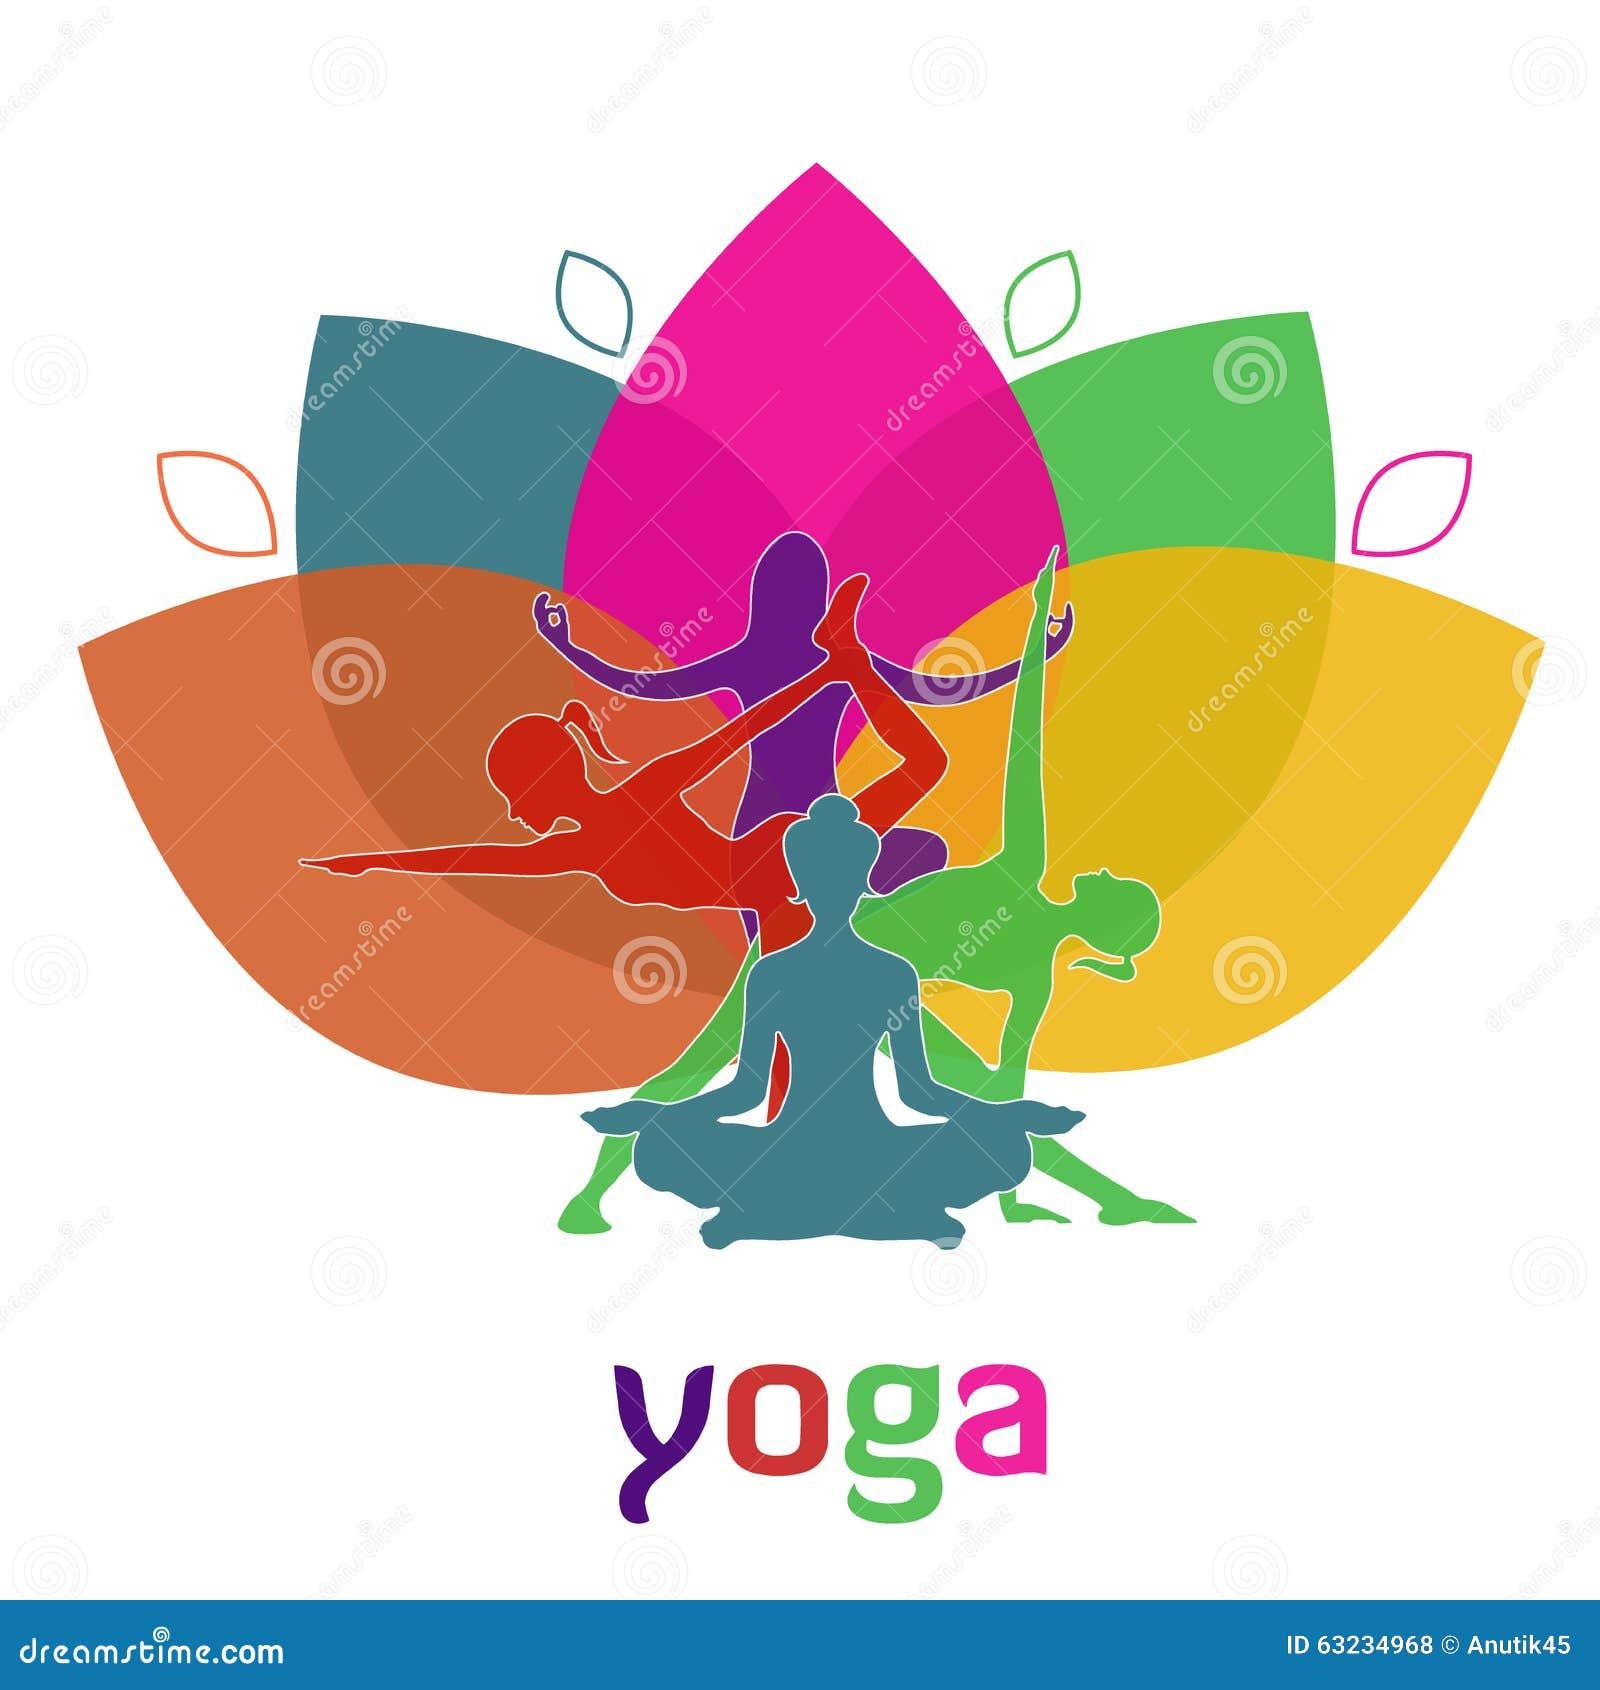 Flower Drawing App: Blossom, Lotus, Flower, Yoga, Vector Illustration, App